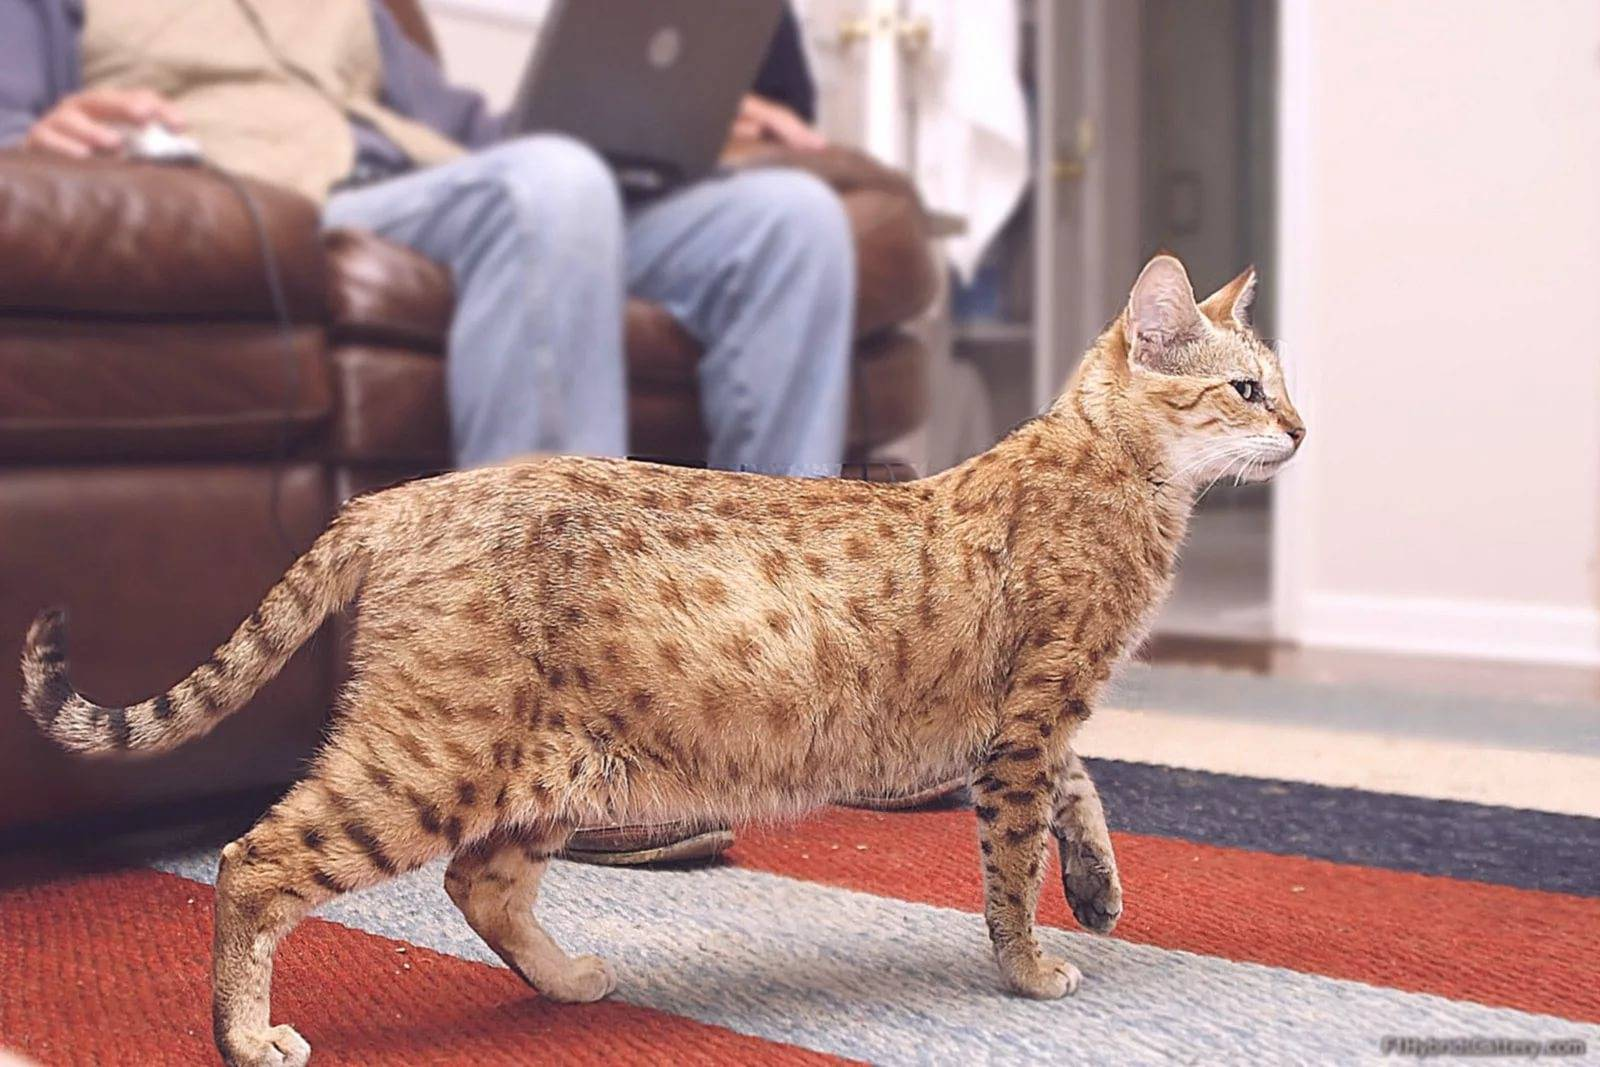 Самая дорогая кошка в мире и 18 наиболее дорогих красавиц! | wikiq.ru